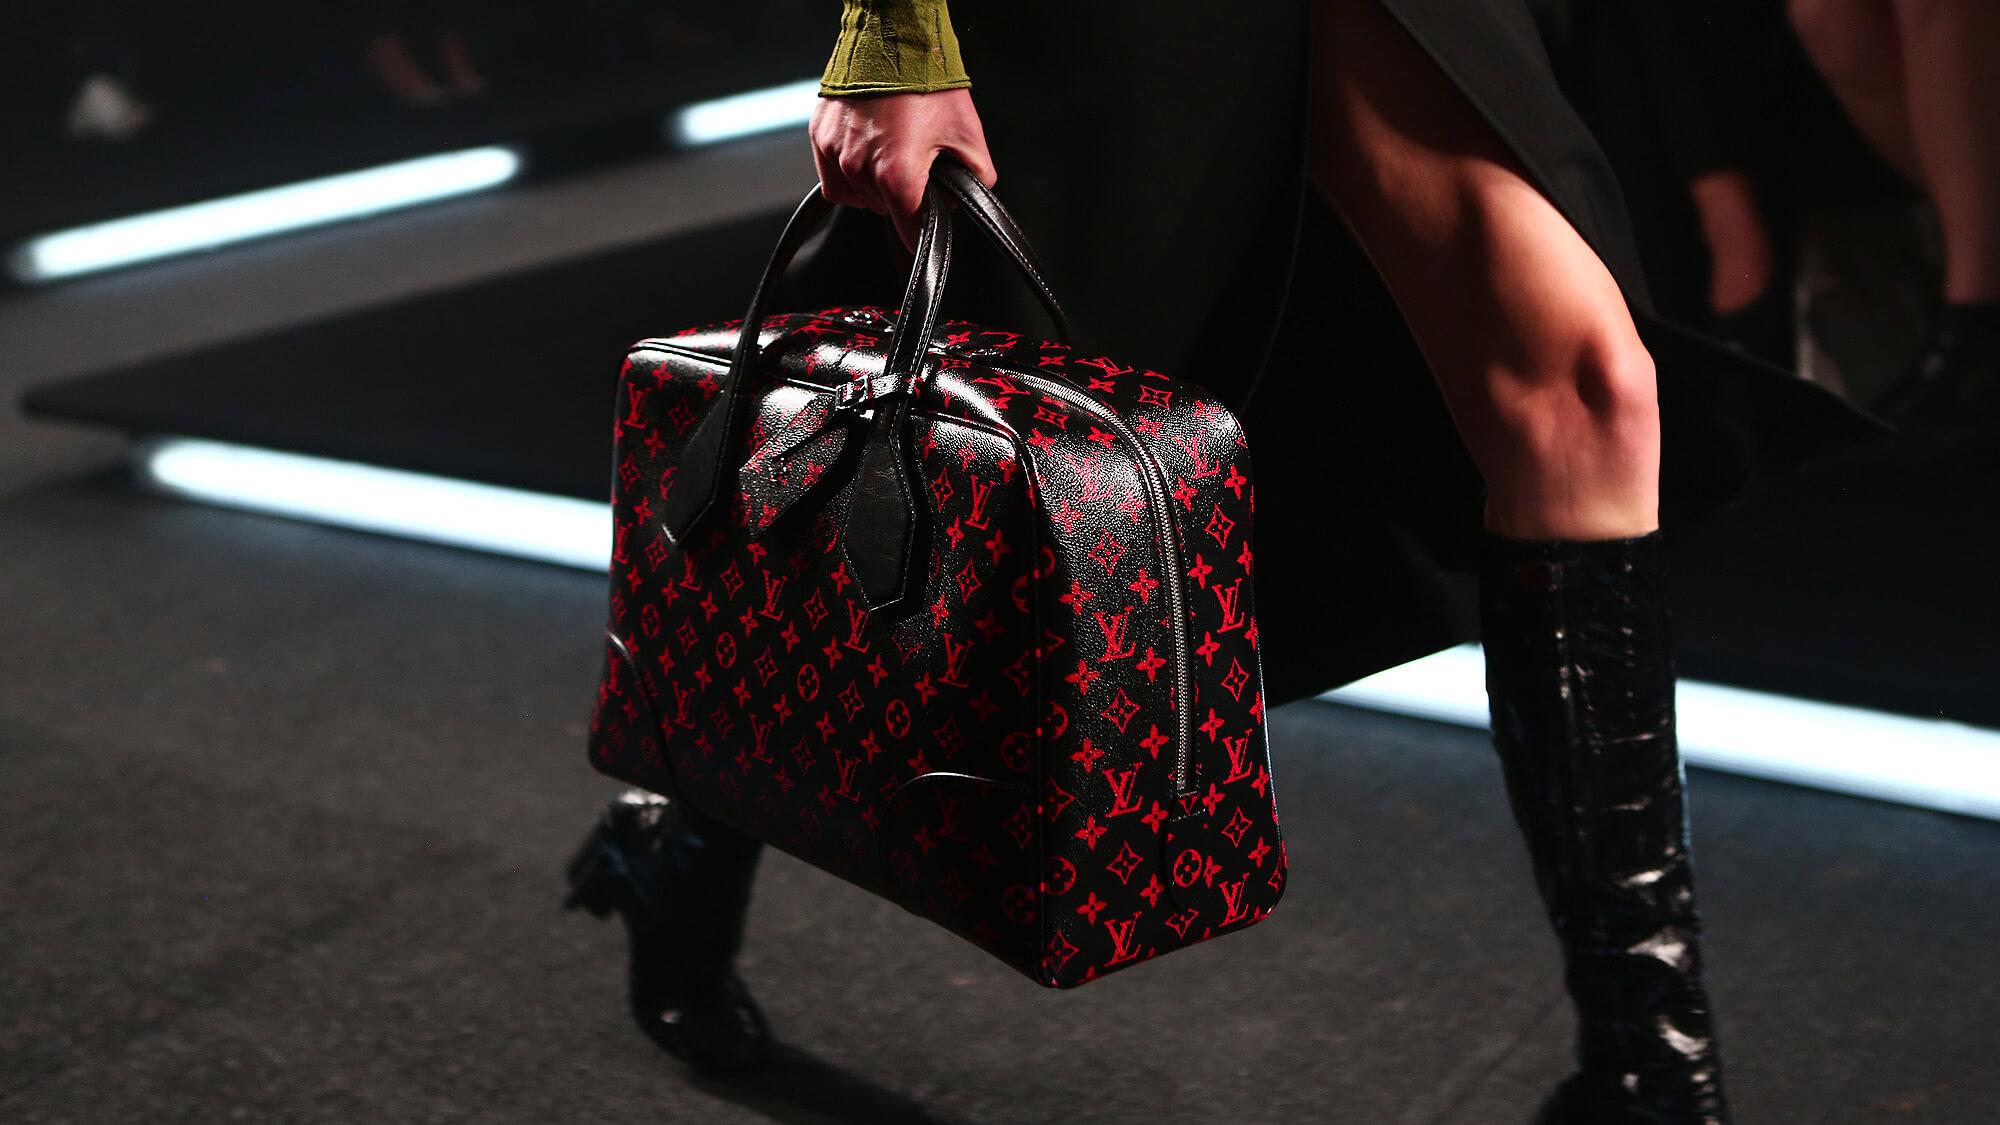 2_louis-vuitton-handbag-at-fashion-show